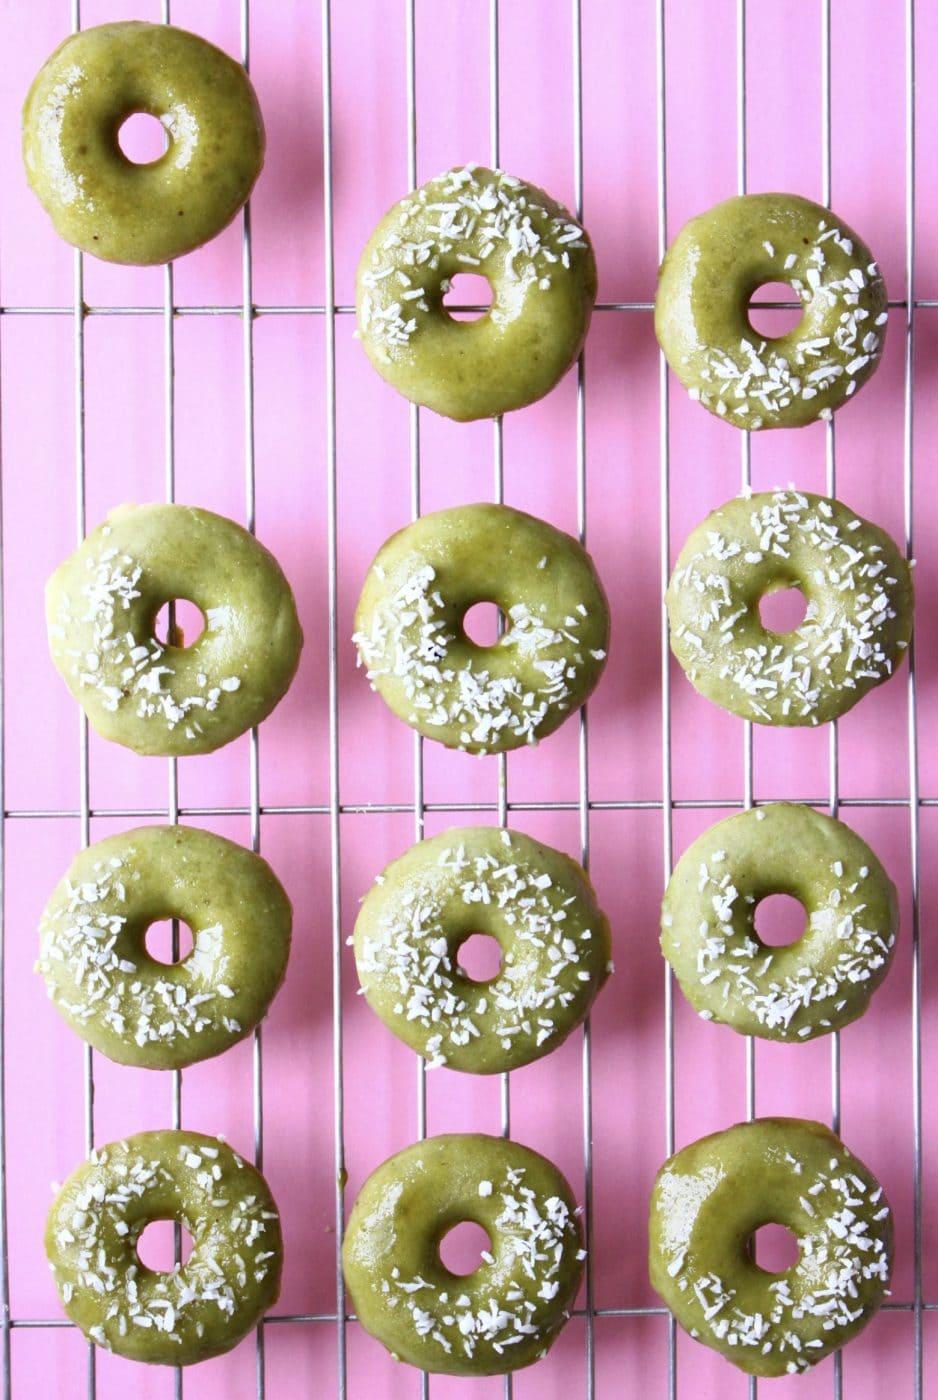 Rhian's Recipes: Vegan Matcha Baked Donuts (GF)